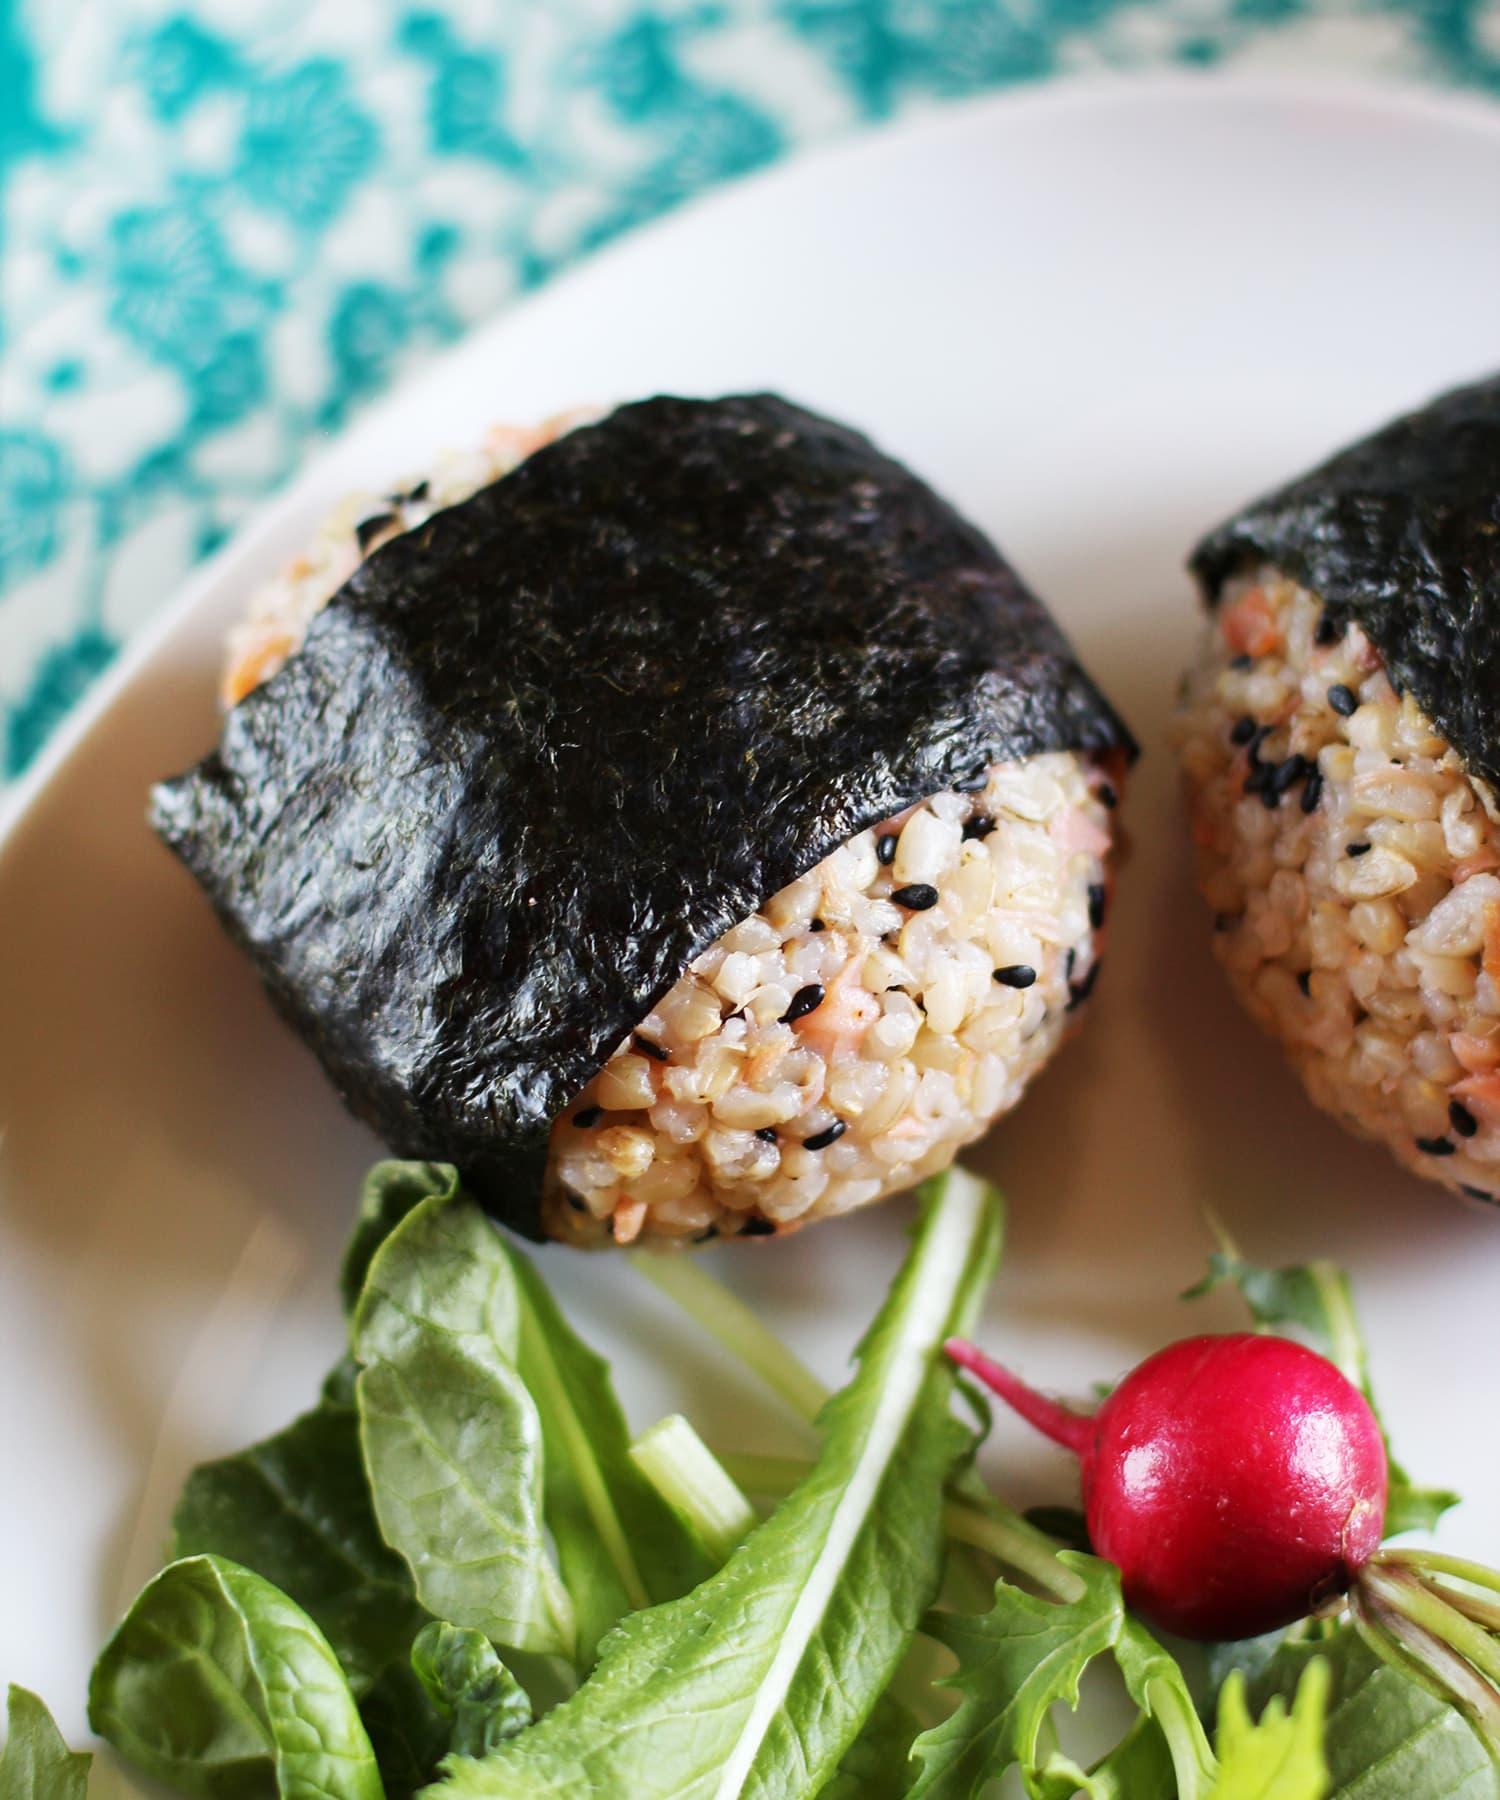 Recipe: Salmon and Black Sesame Onigiri (Japanese Rice Balls)